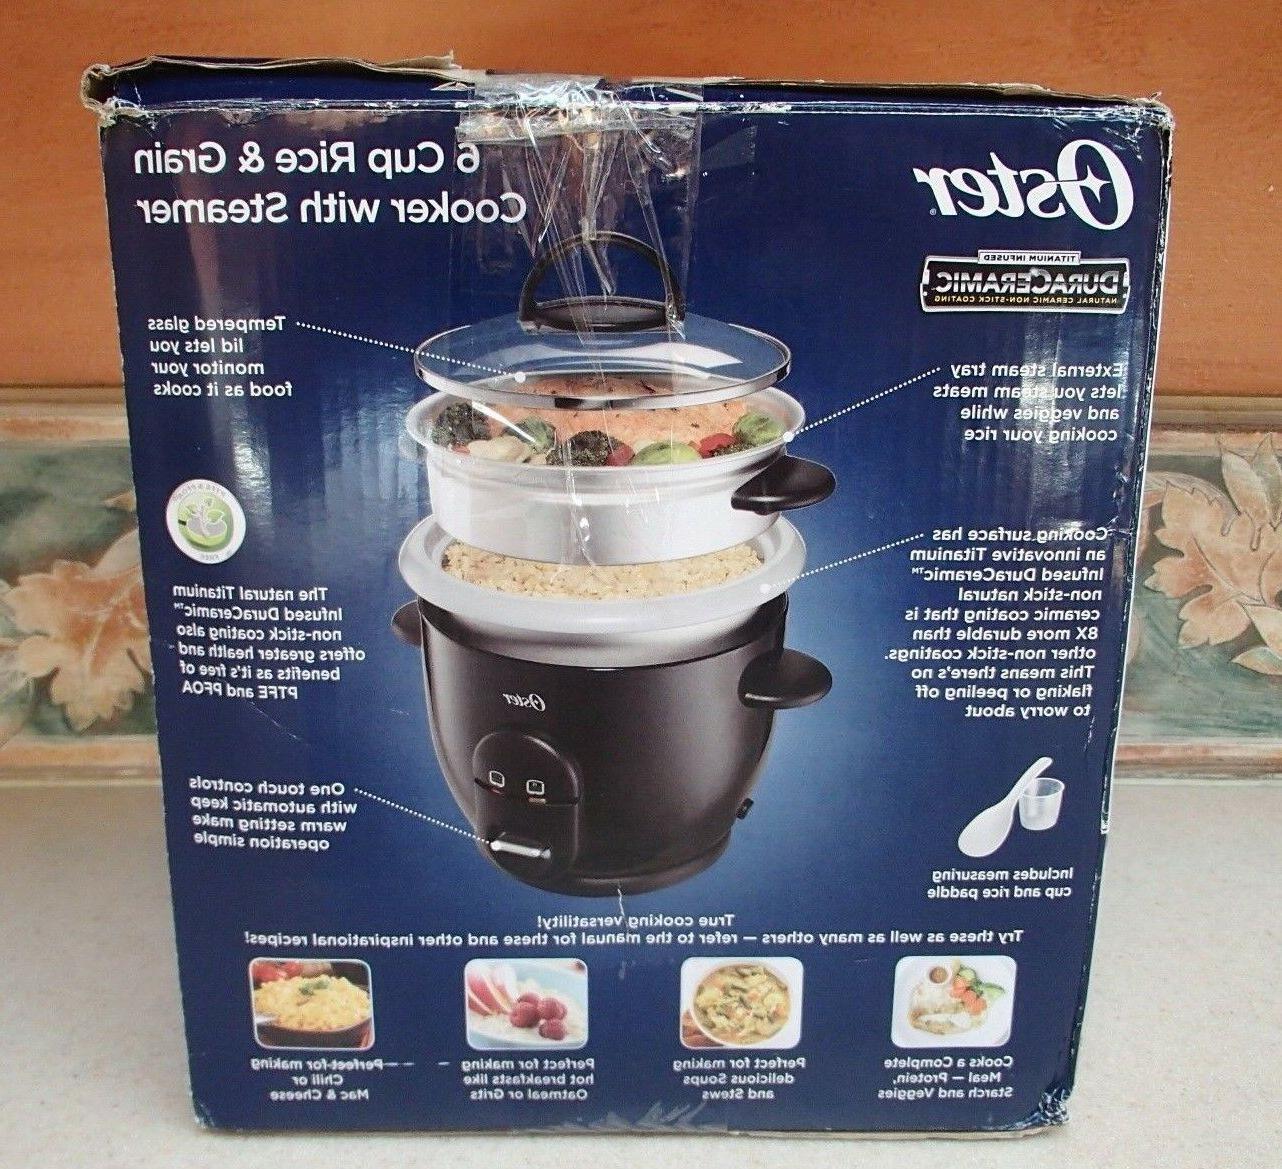 OSTER Rice Food Steamer Vegetables Kitchen 6 - NIB,RV$35